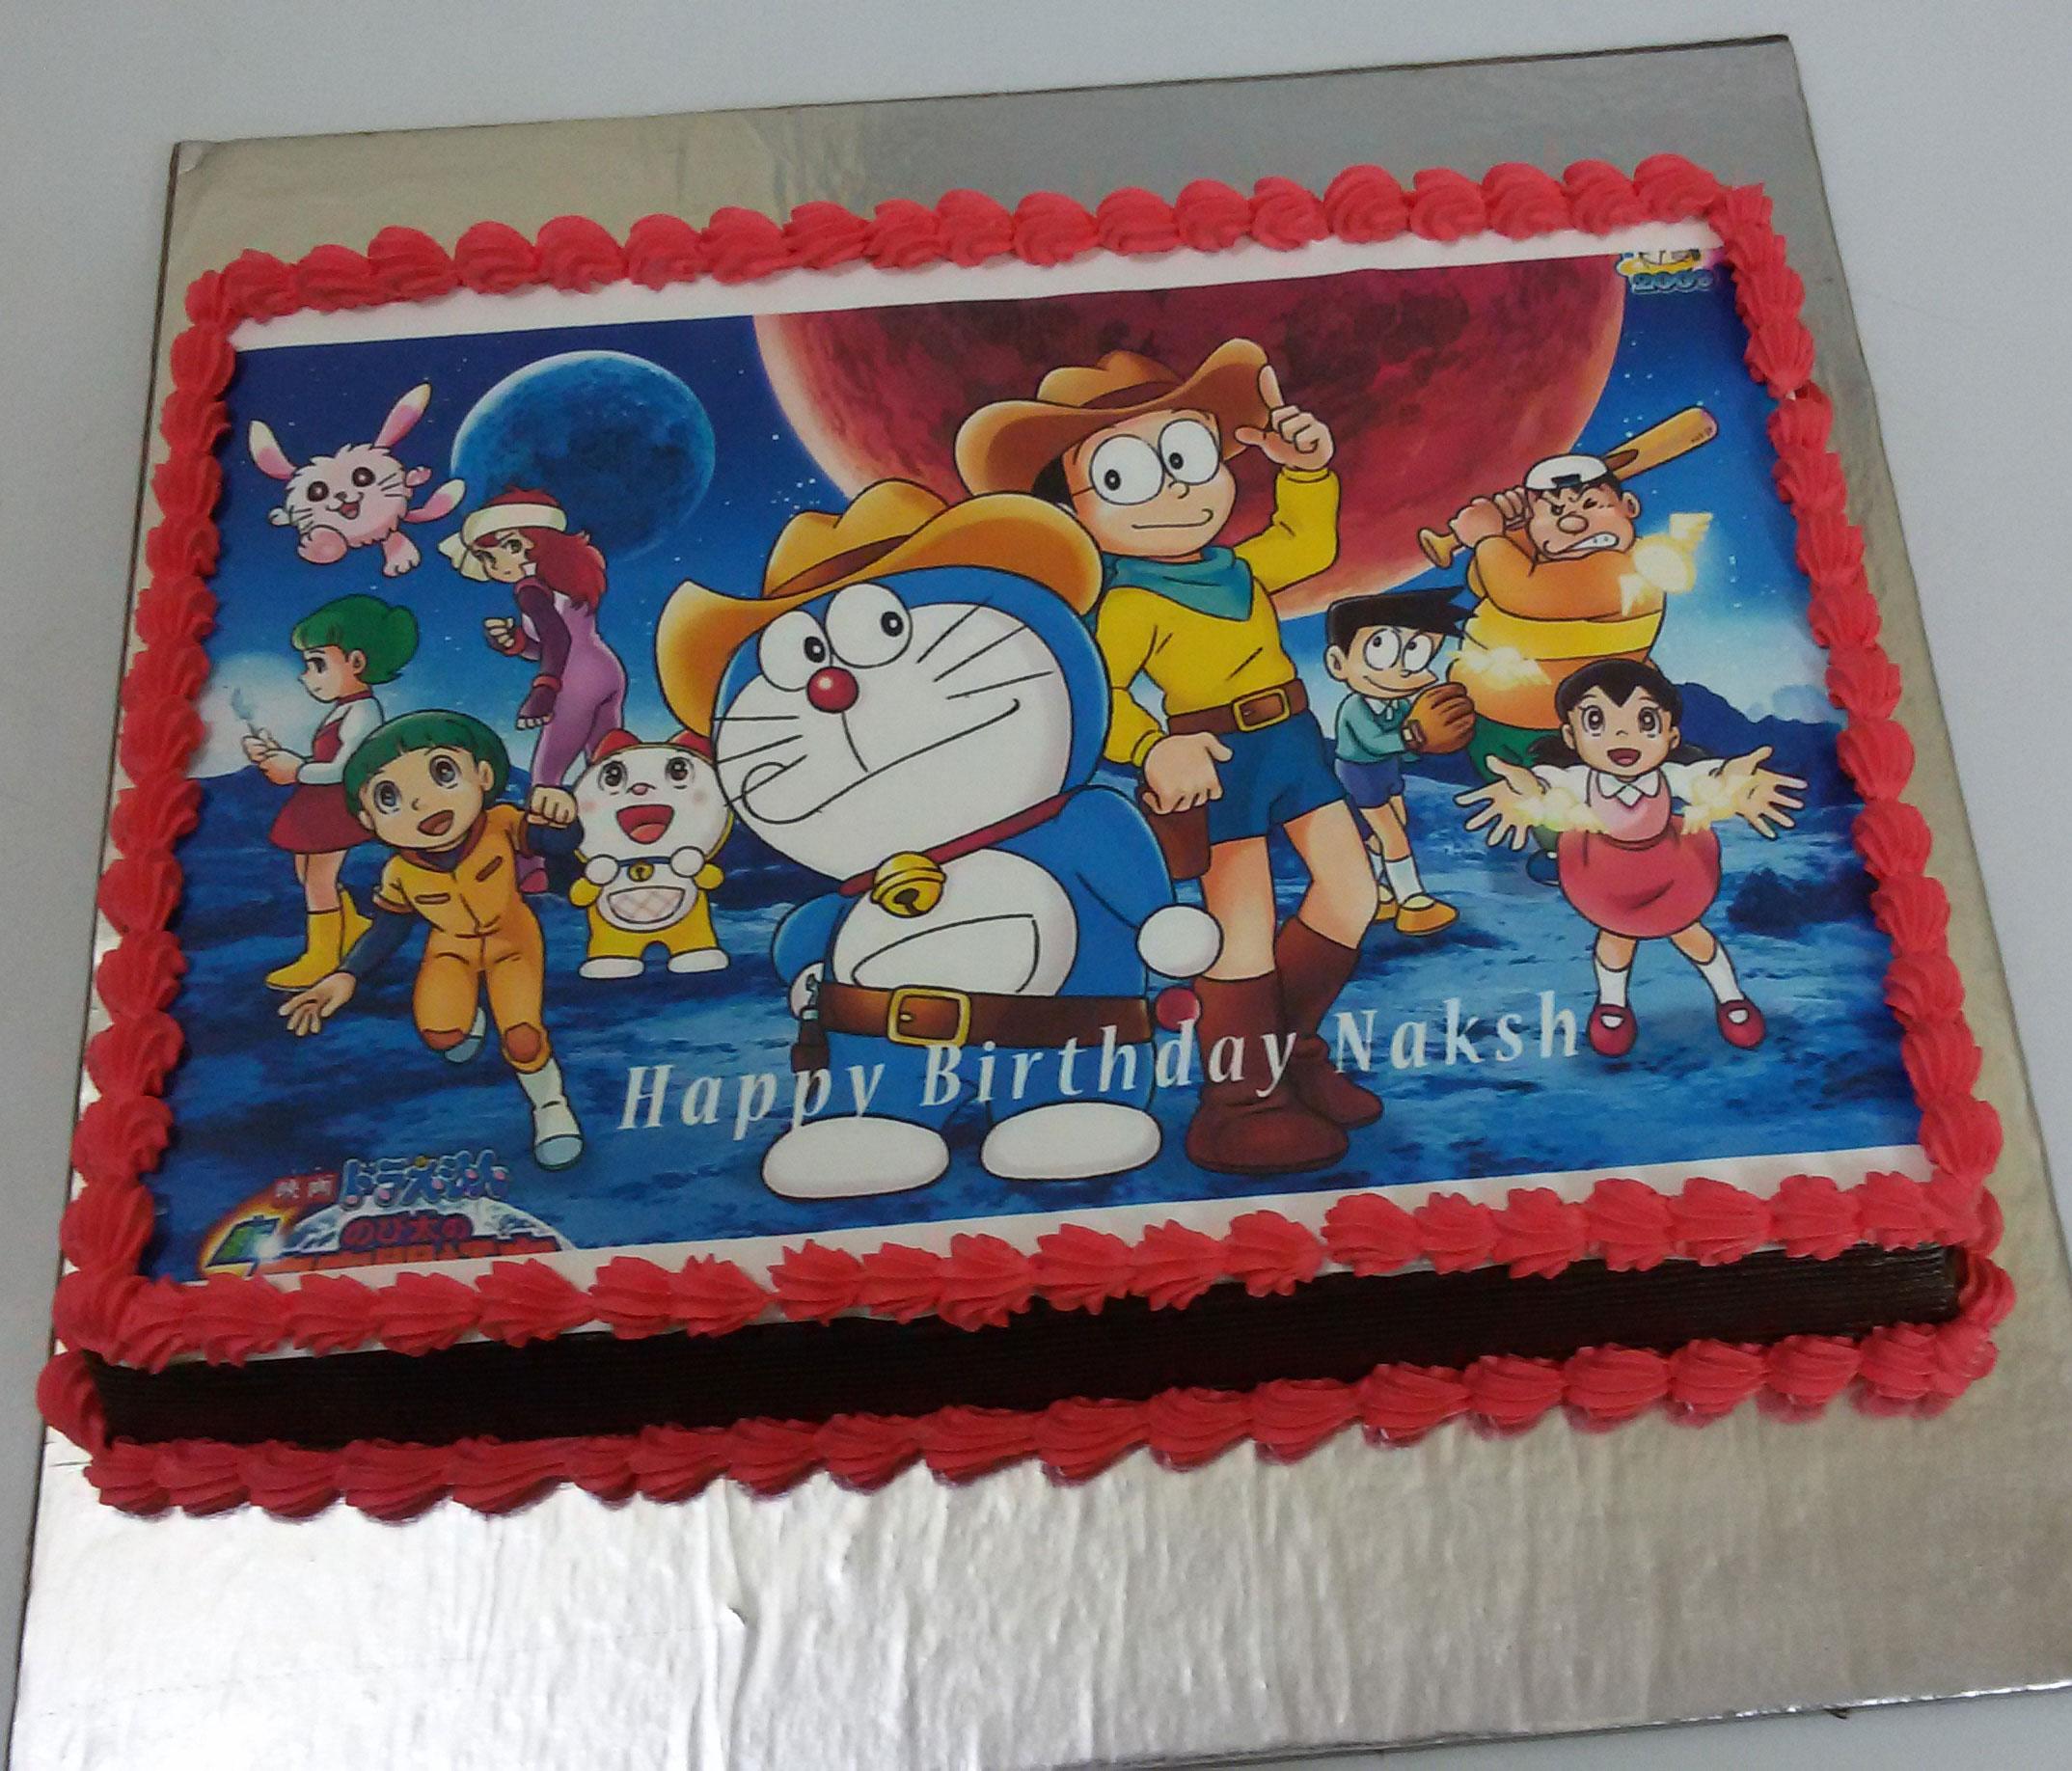 Birthday 2 Kg Cake Images : Order Doraemon Photo Cake From Yummycake at Best Price